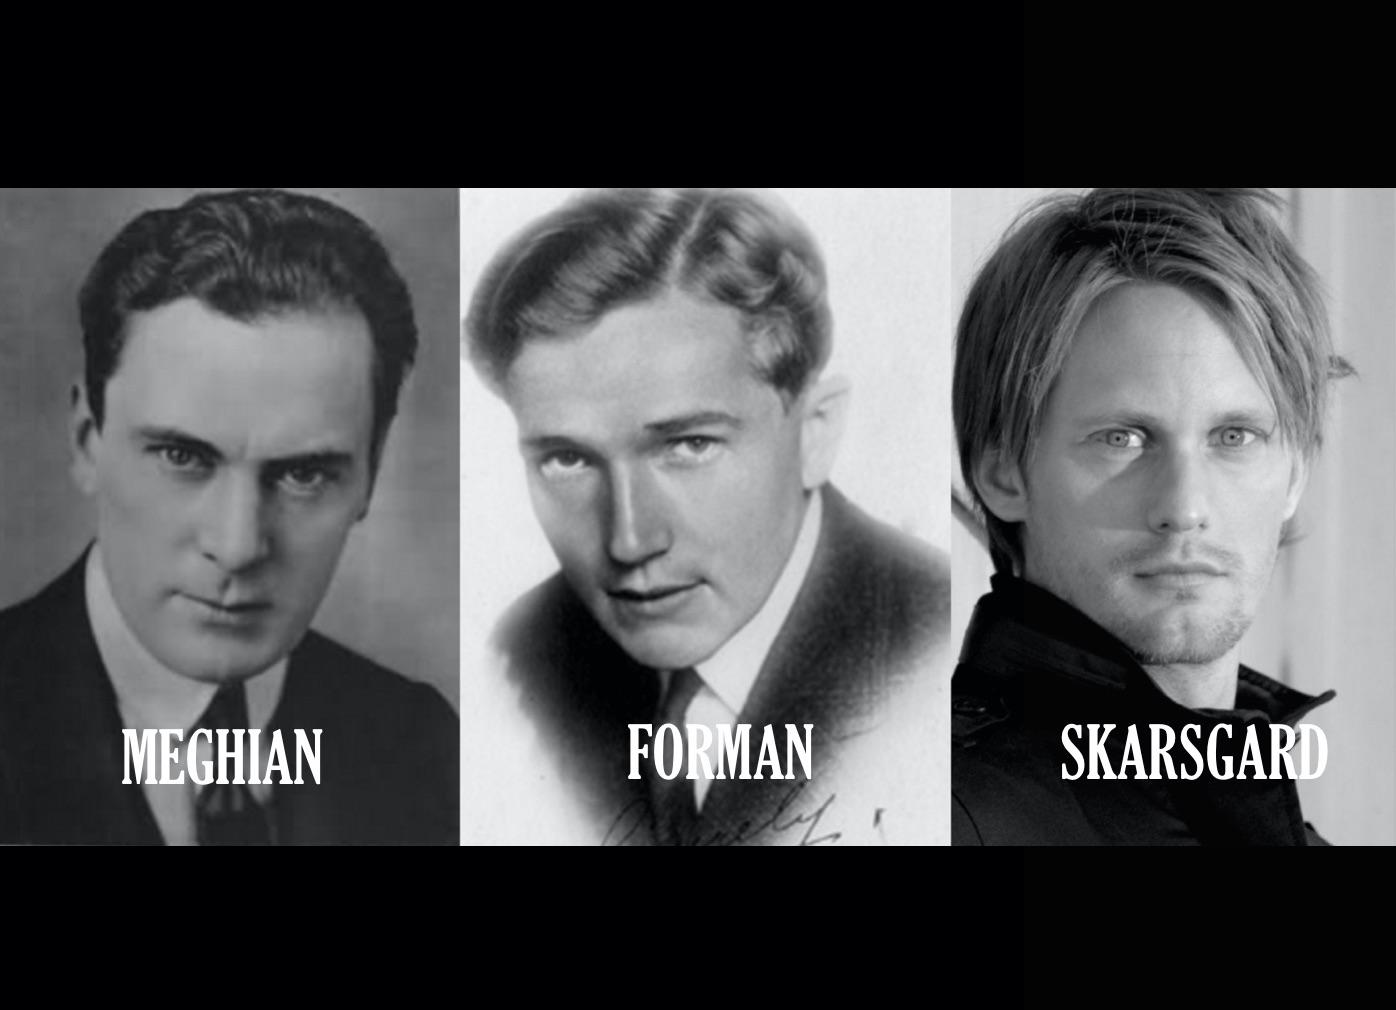 Would Edgar Rice Burroughs Have Approved of Alexander Skarsgard as Tarzan?